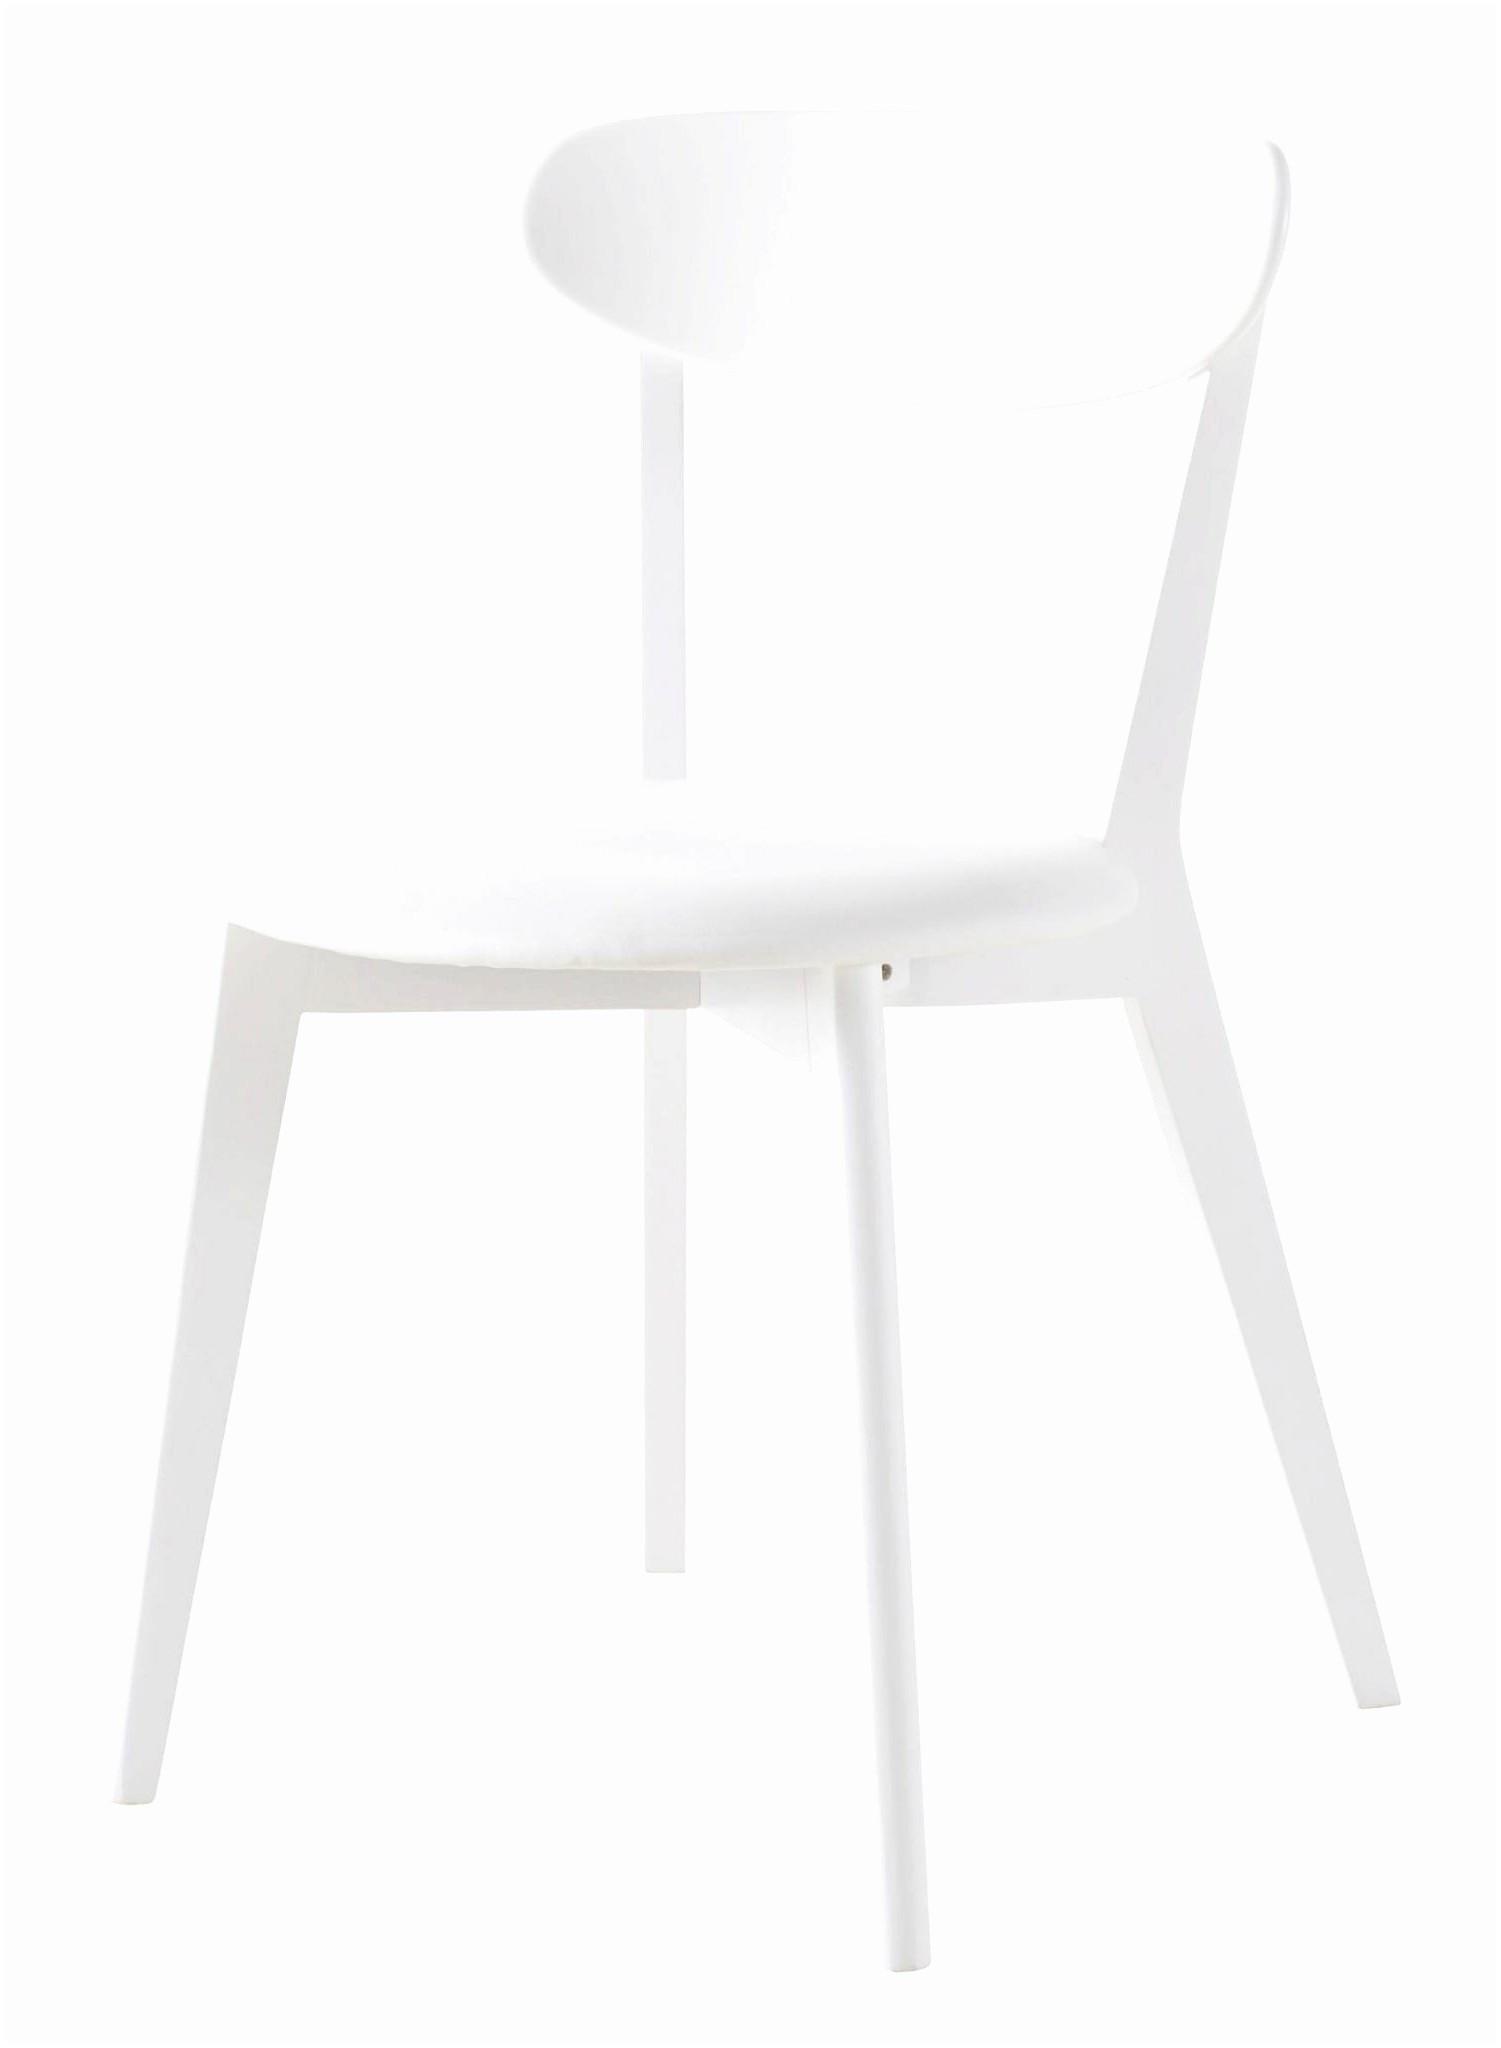 coiffeuse meuble fly coiffeuse meuble fly table basse ubaldi belle fly fr meubles de luxe of coiffeuse meuble fly